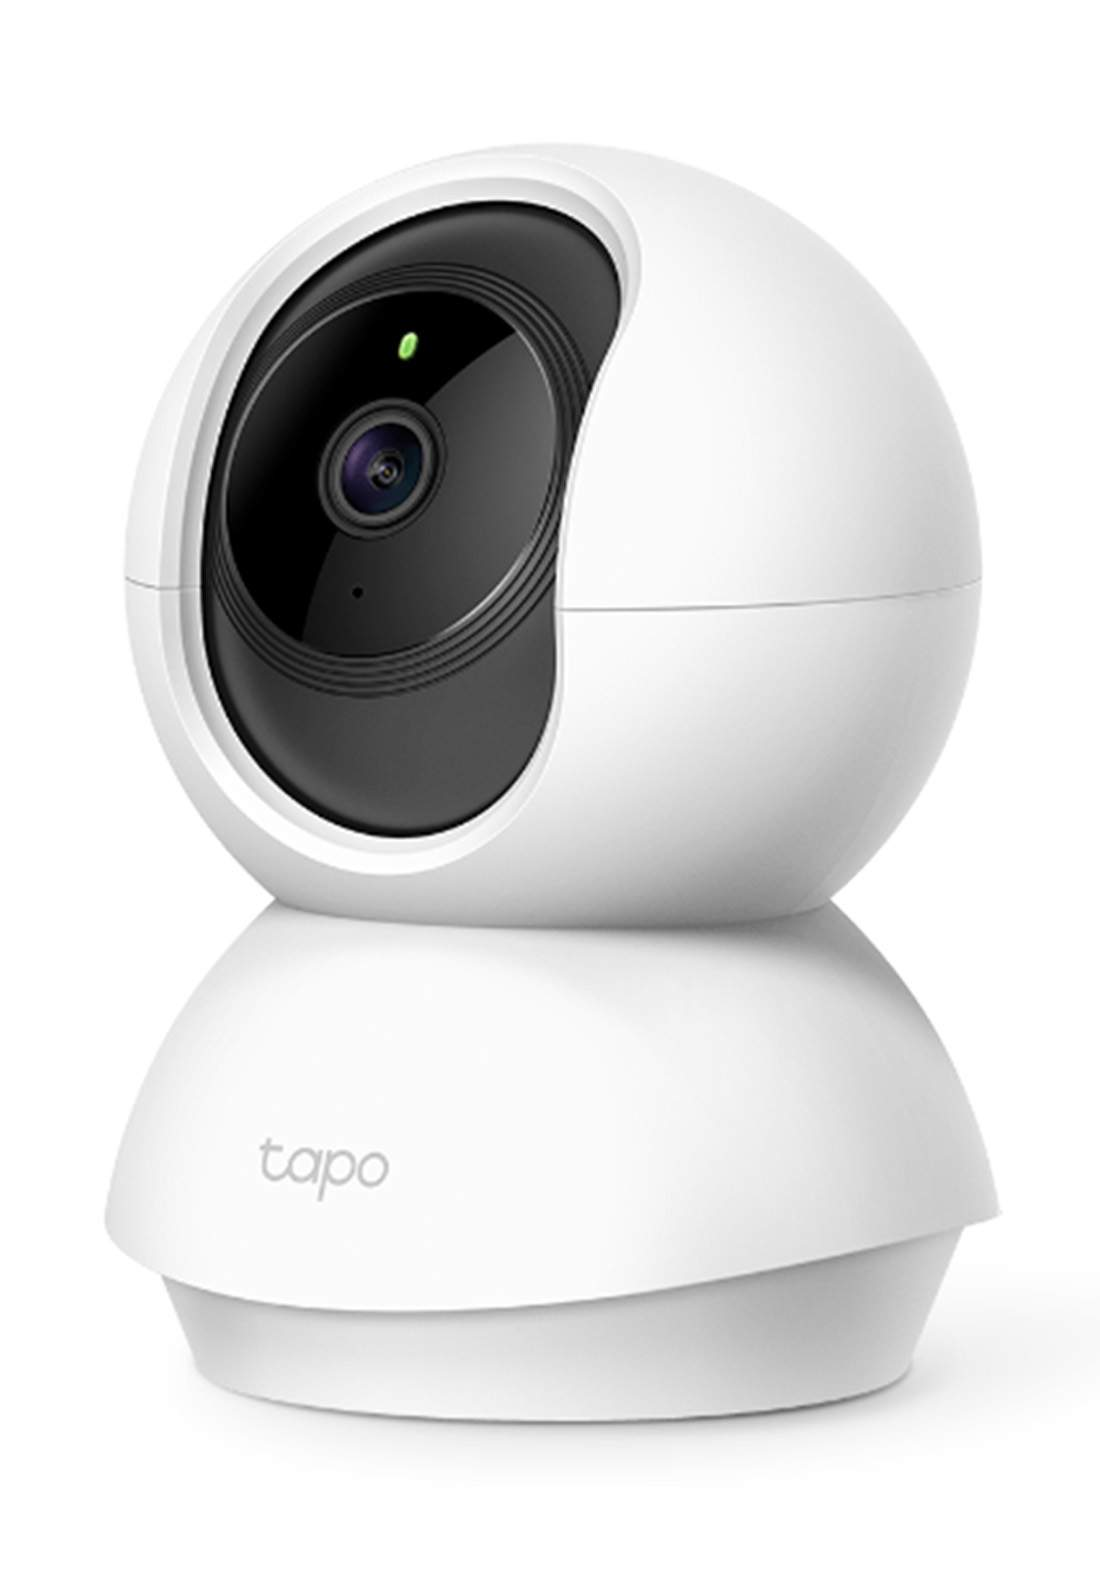 Tp-Link  Tapo C200 Pan Tilt Home Security Wi-Fi Camera - White كاميرا مراقبة